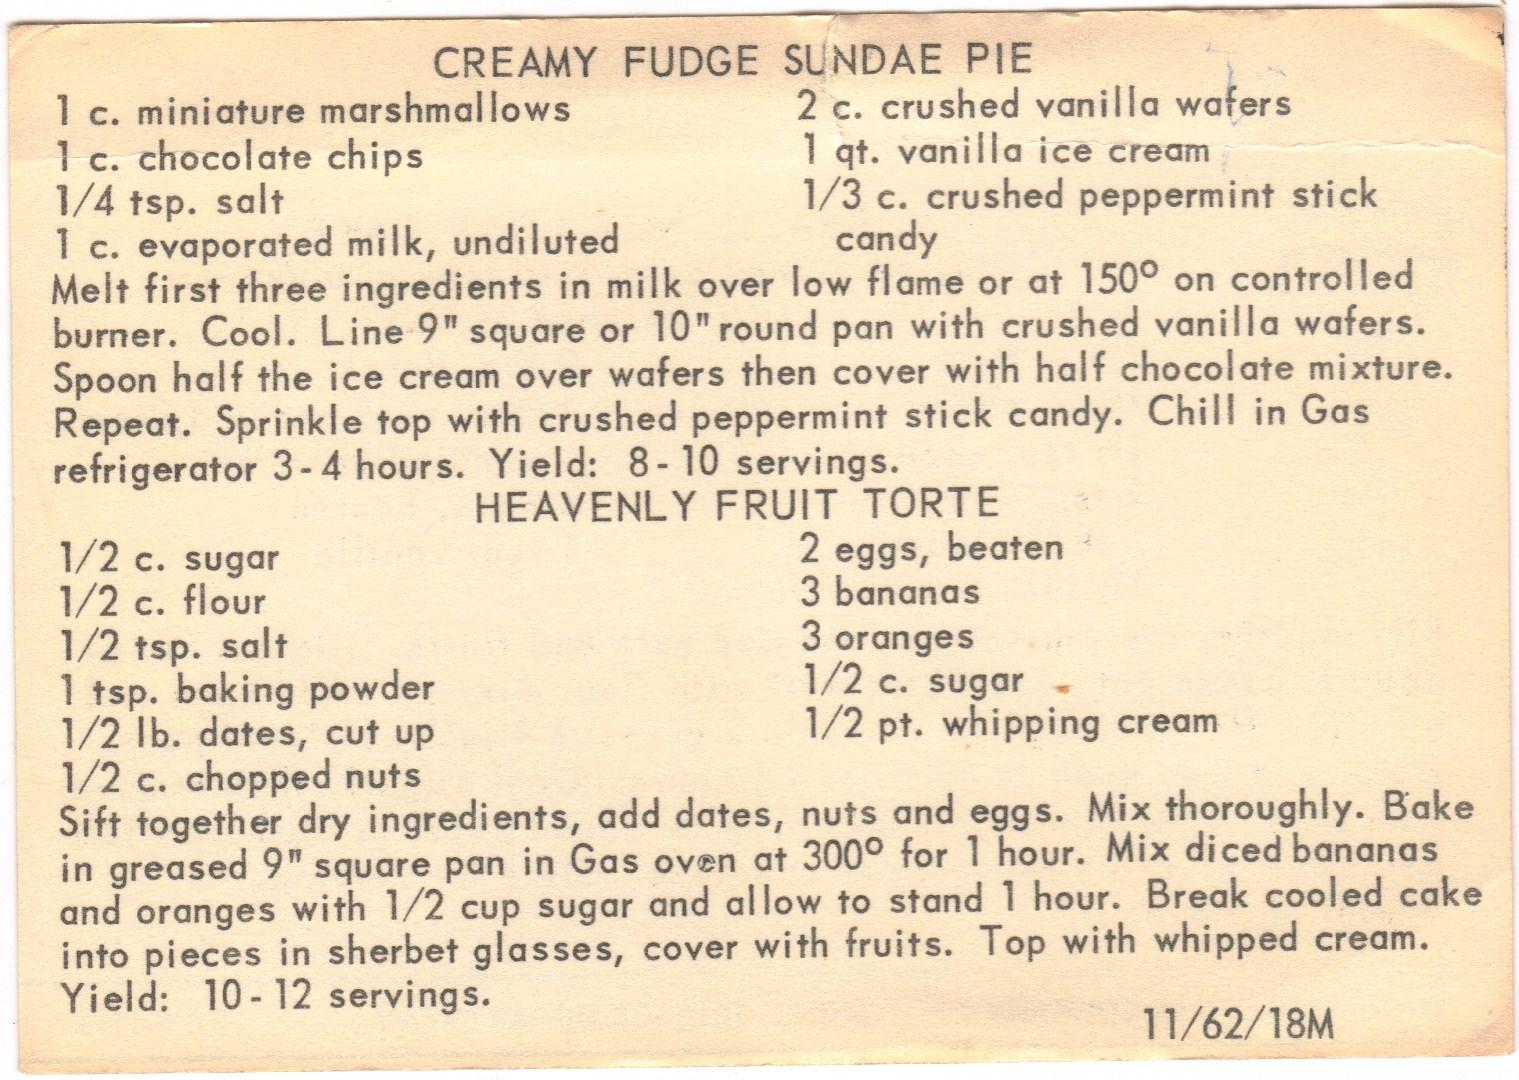 ... Box: Farmers Market and a Backyard Party: Creamy Fudge Sundae Pie